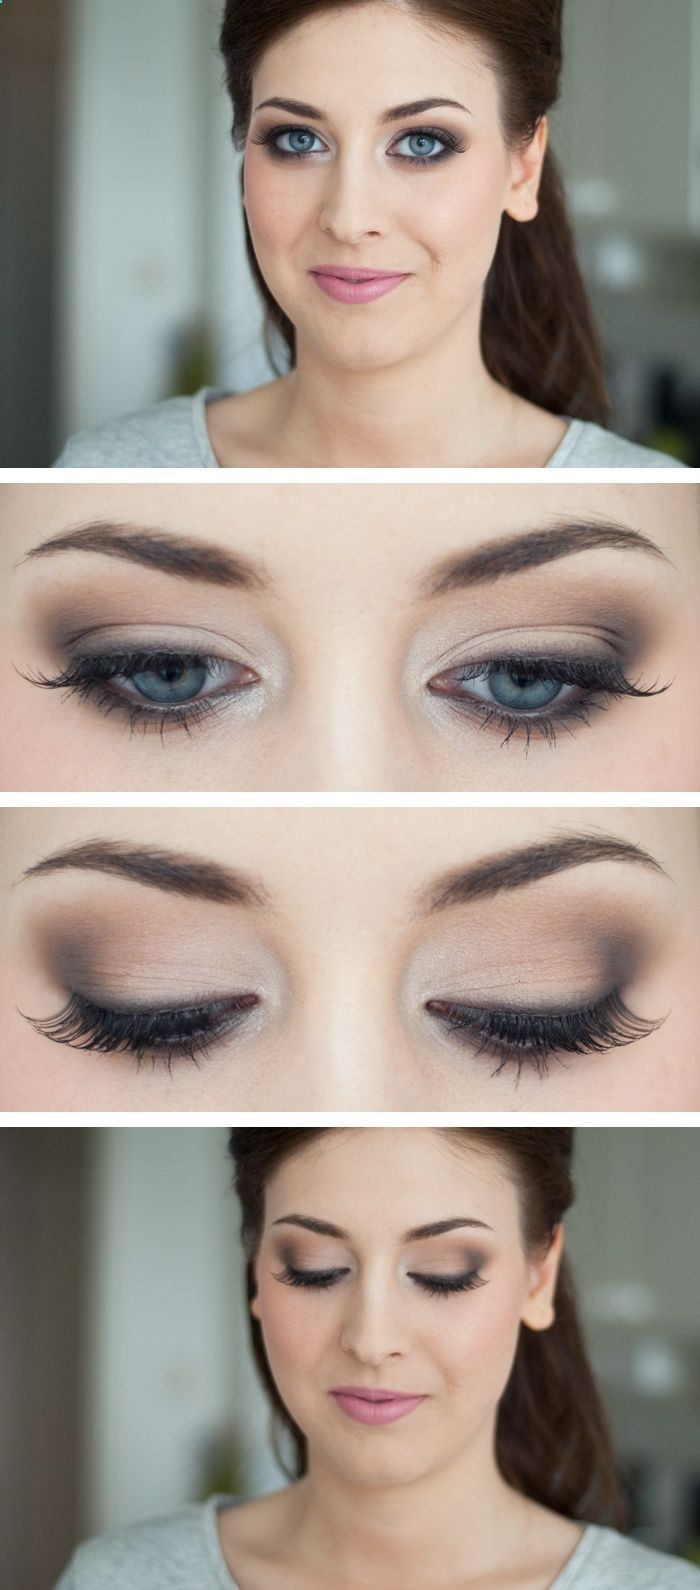 8 classic makeup tutorials for teenagers natural eye makeup 8 classic makeup tutorials for teenagers light smokey eyenatural baditri Image collections